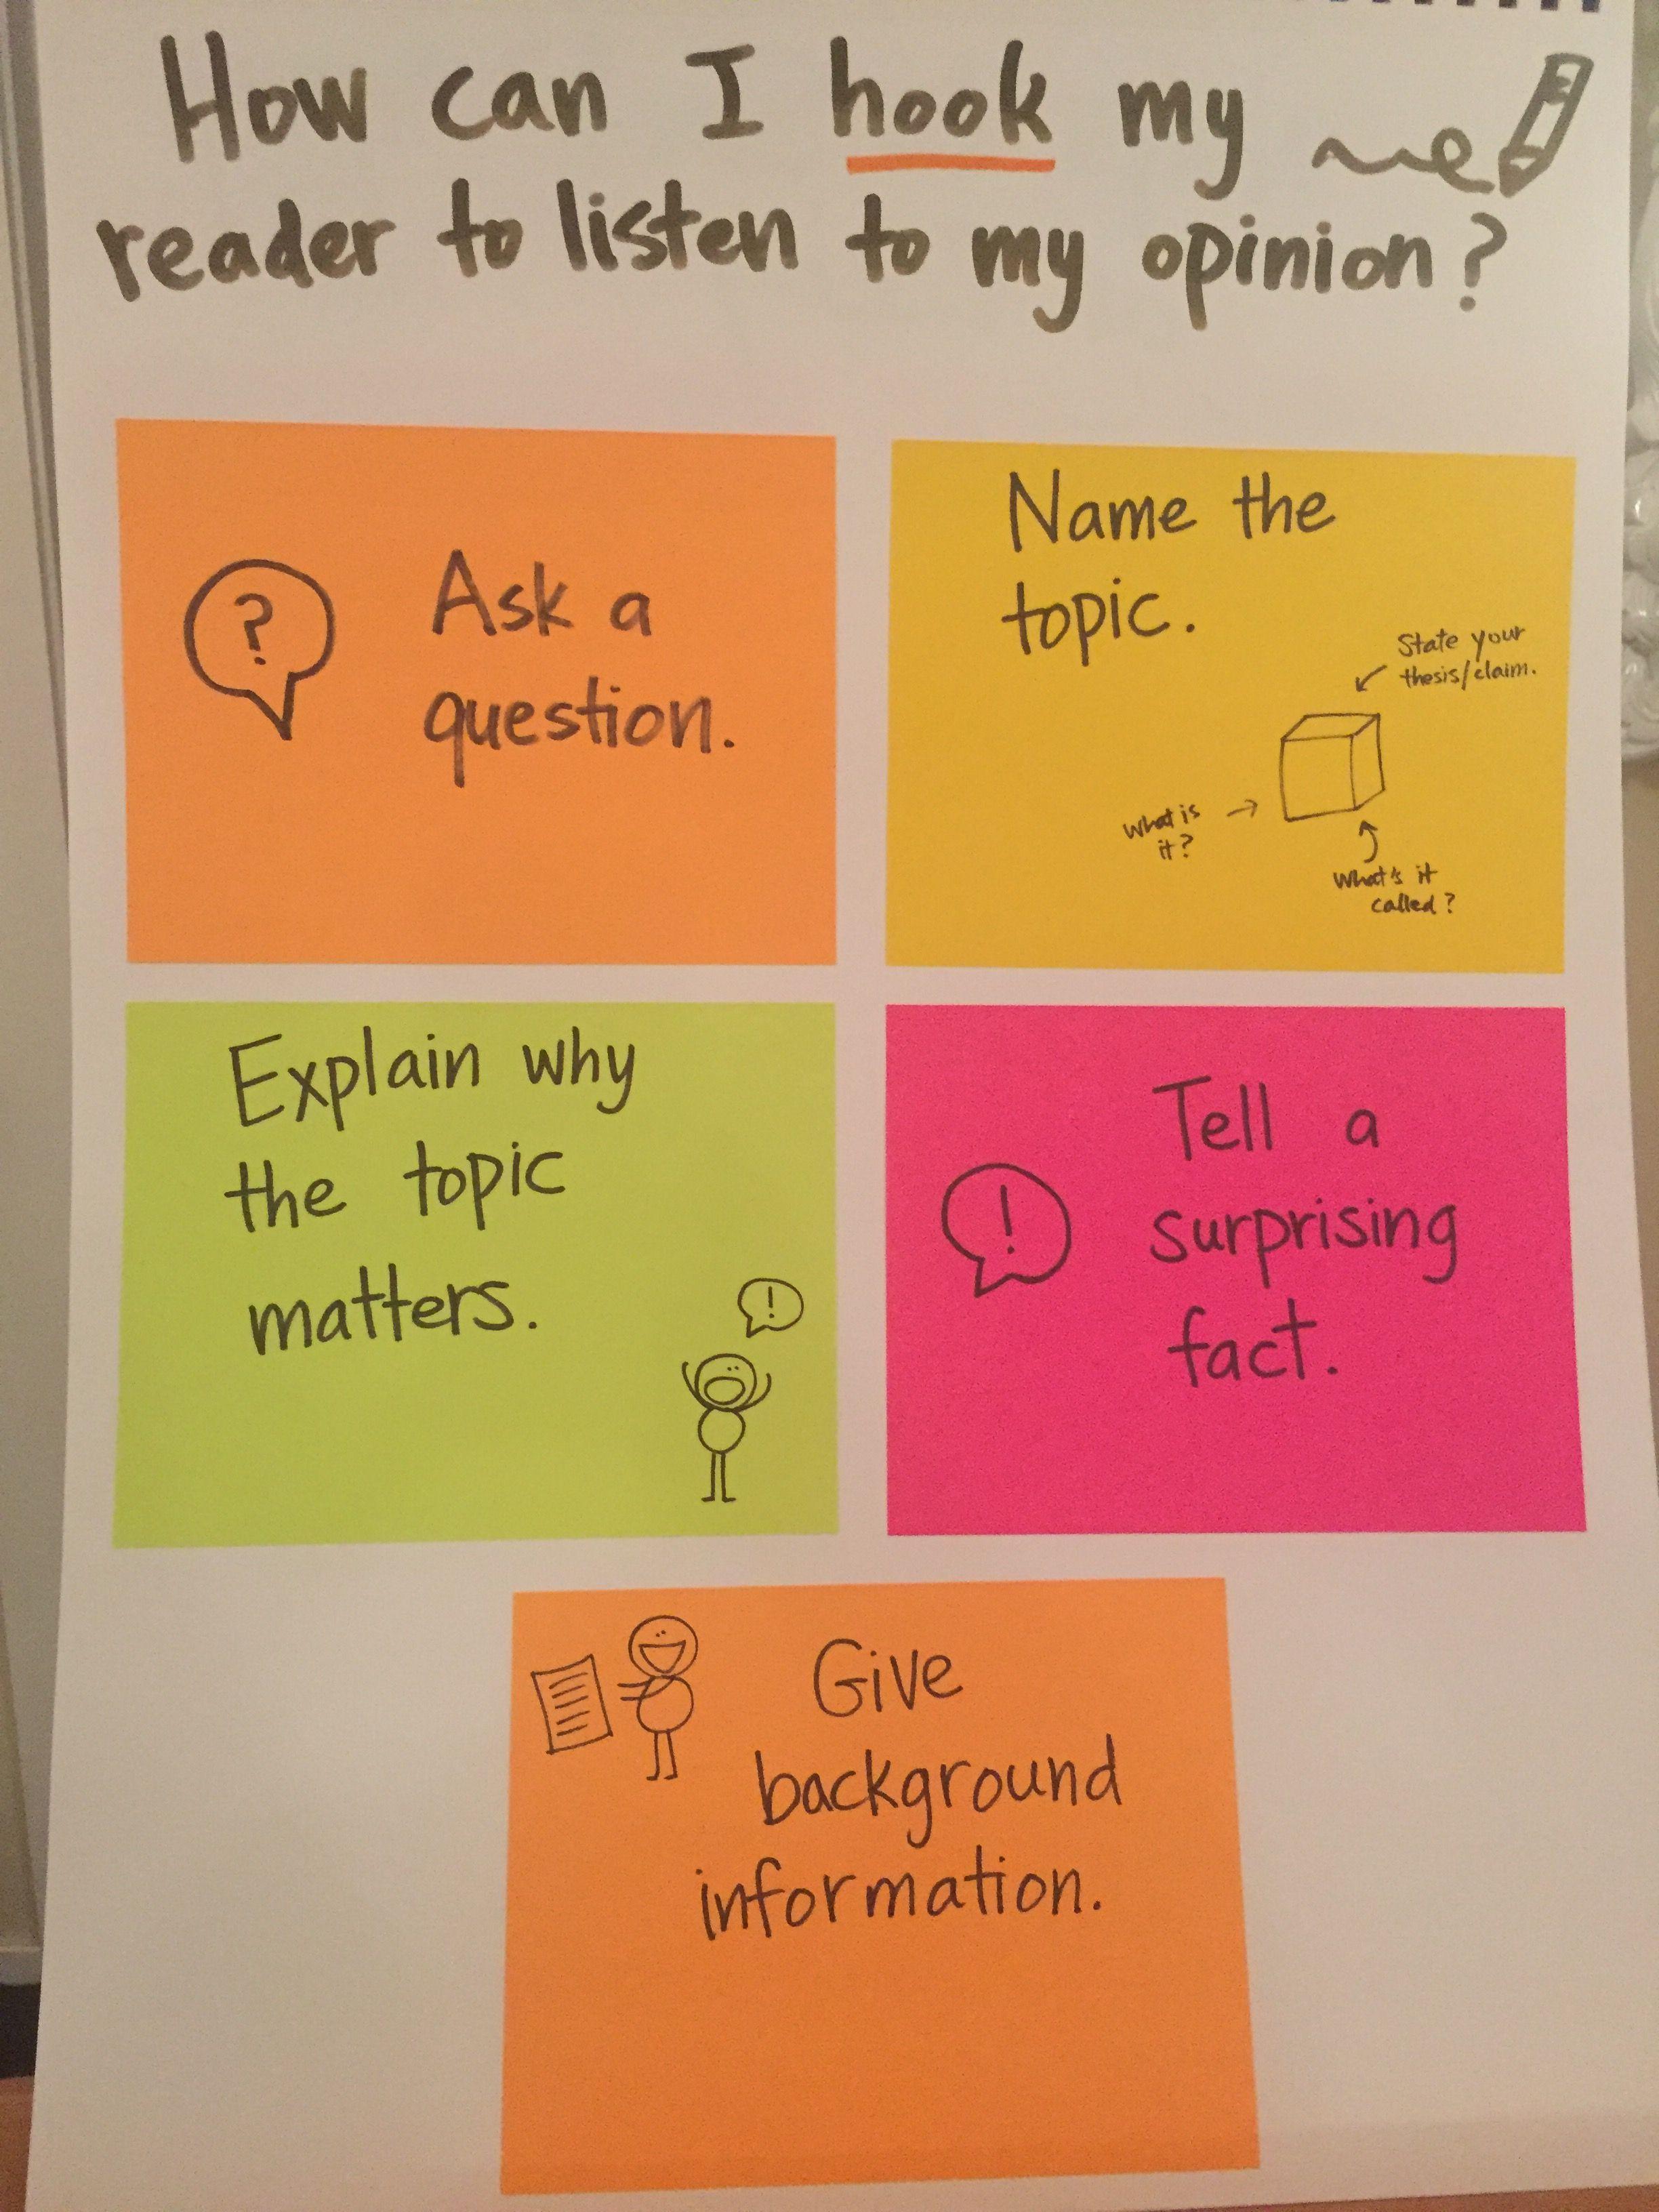 Opinion Hooks Introduction Ideas Writing Mini Lessons Persuasive Writing Writing Introductions